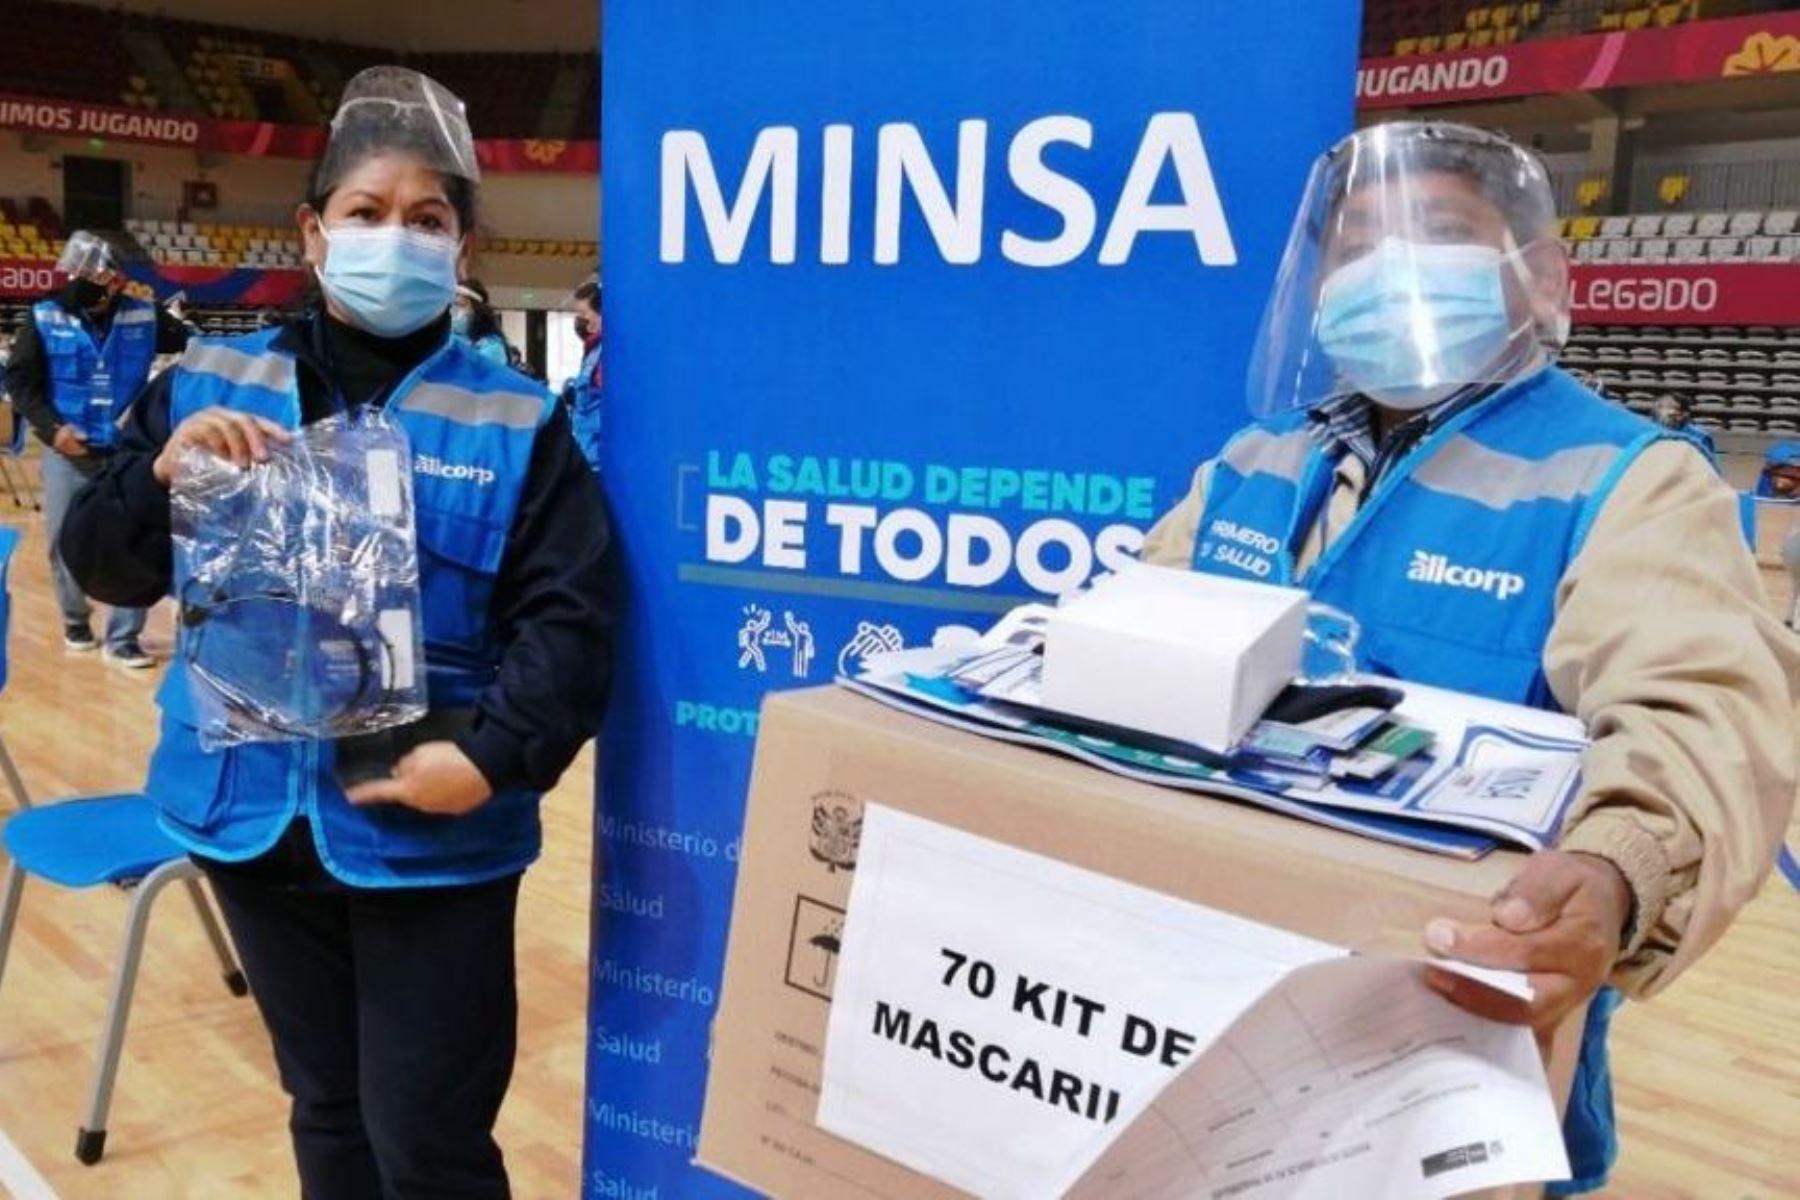 Covid-19: Minsa entrega 5,000 kits de mascarillas a comités comunitarios de Lima Sur